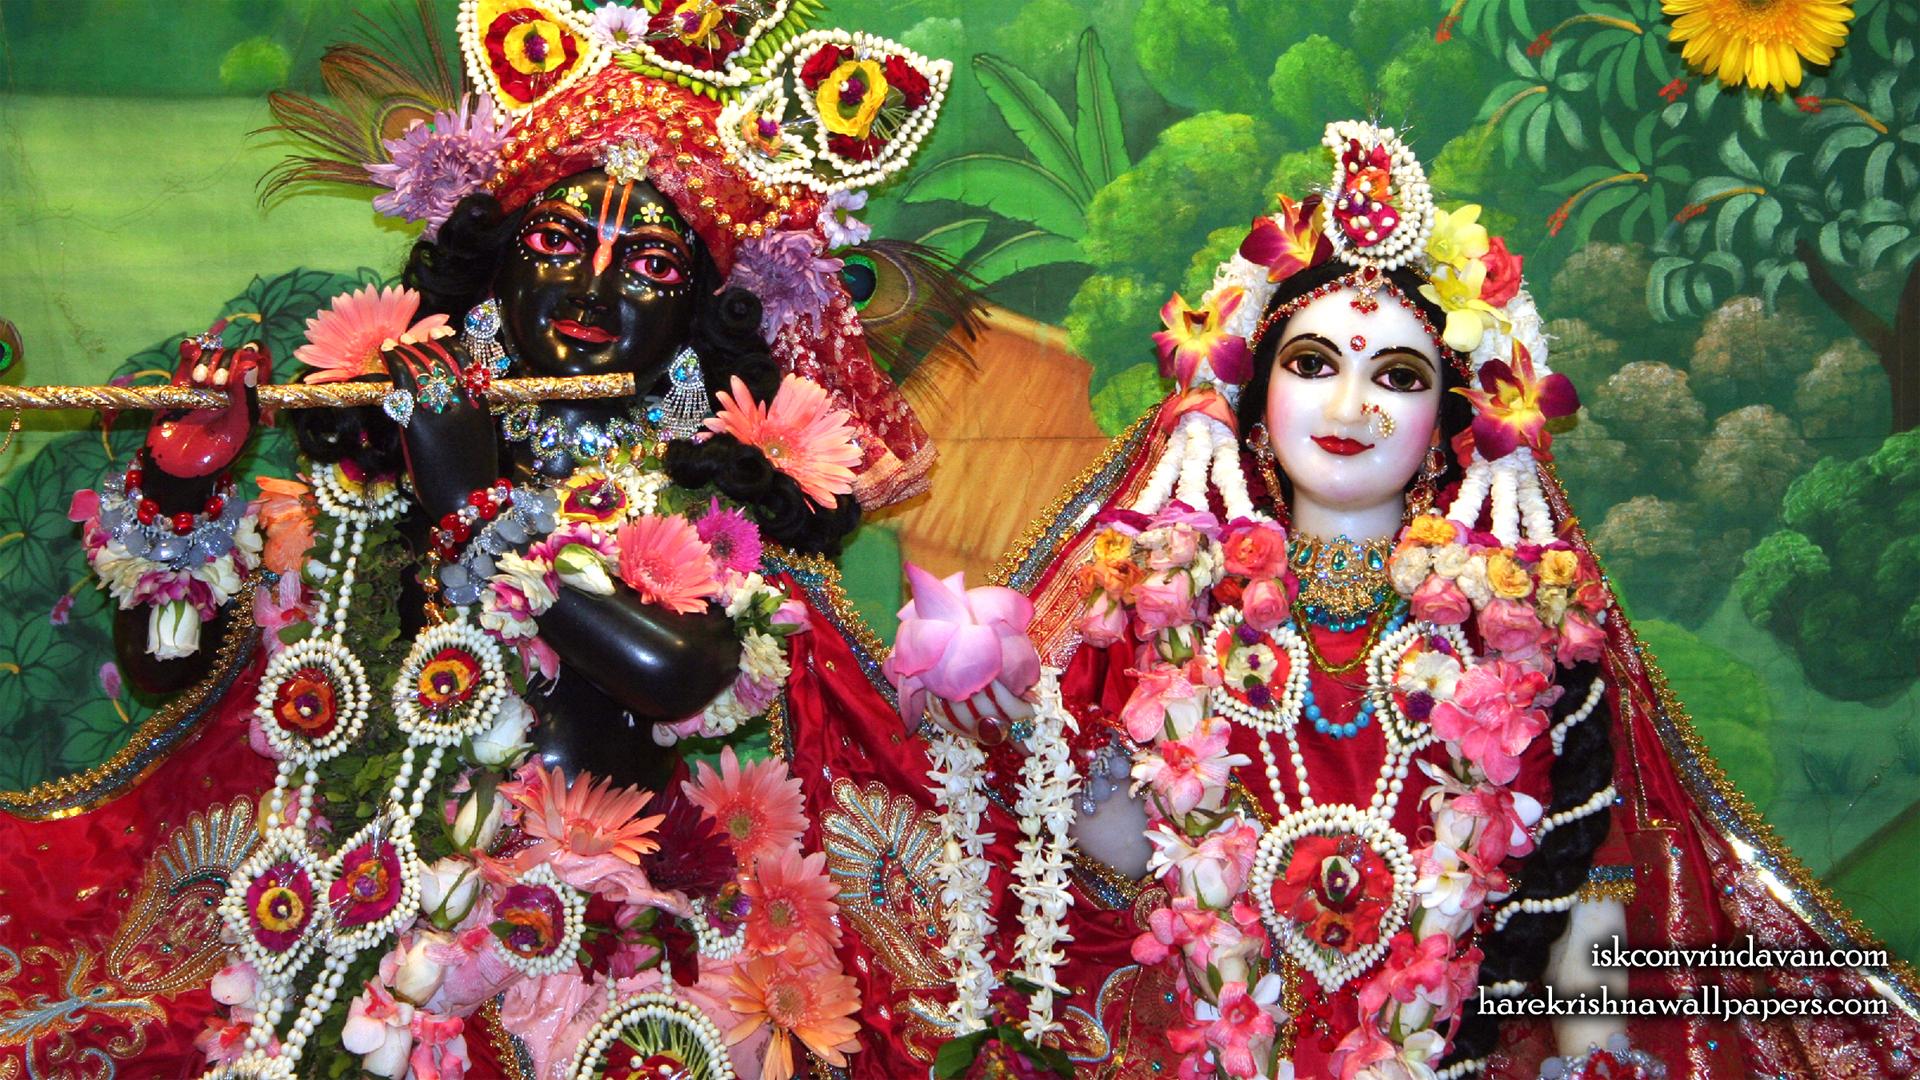 Sri Sri Radha Shyamsundar Close up Wallpaper (012) Size 1920x1080 Download